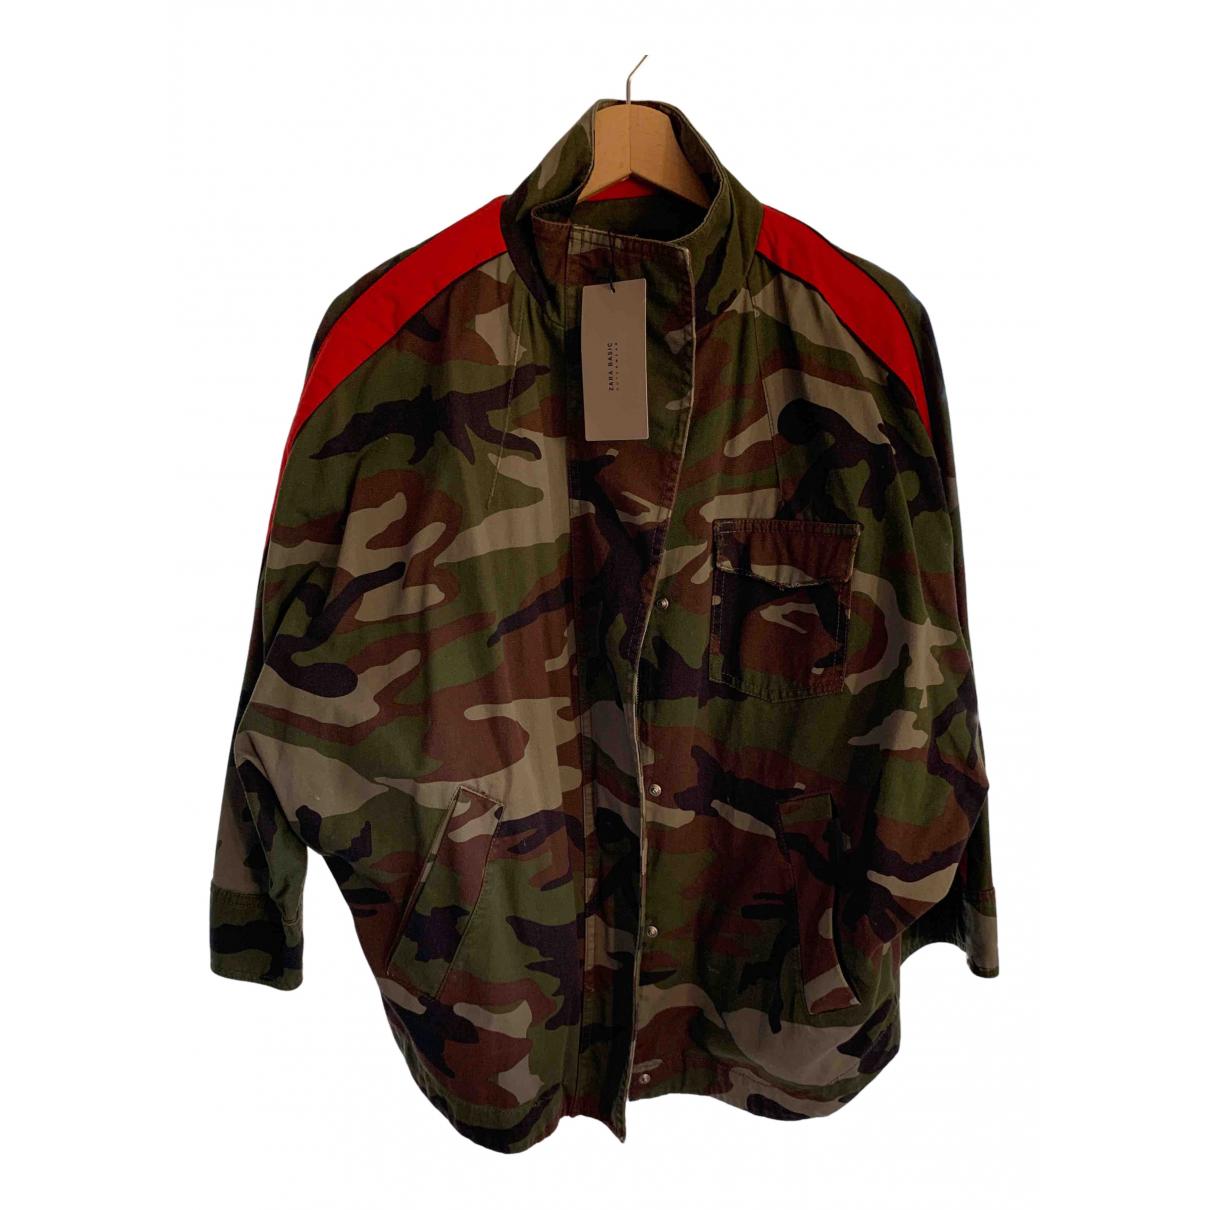 Zara \N Cotton jacket for Women XS International